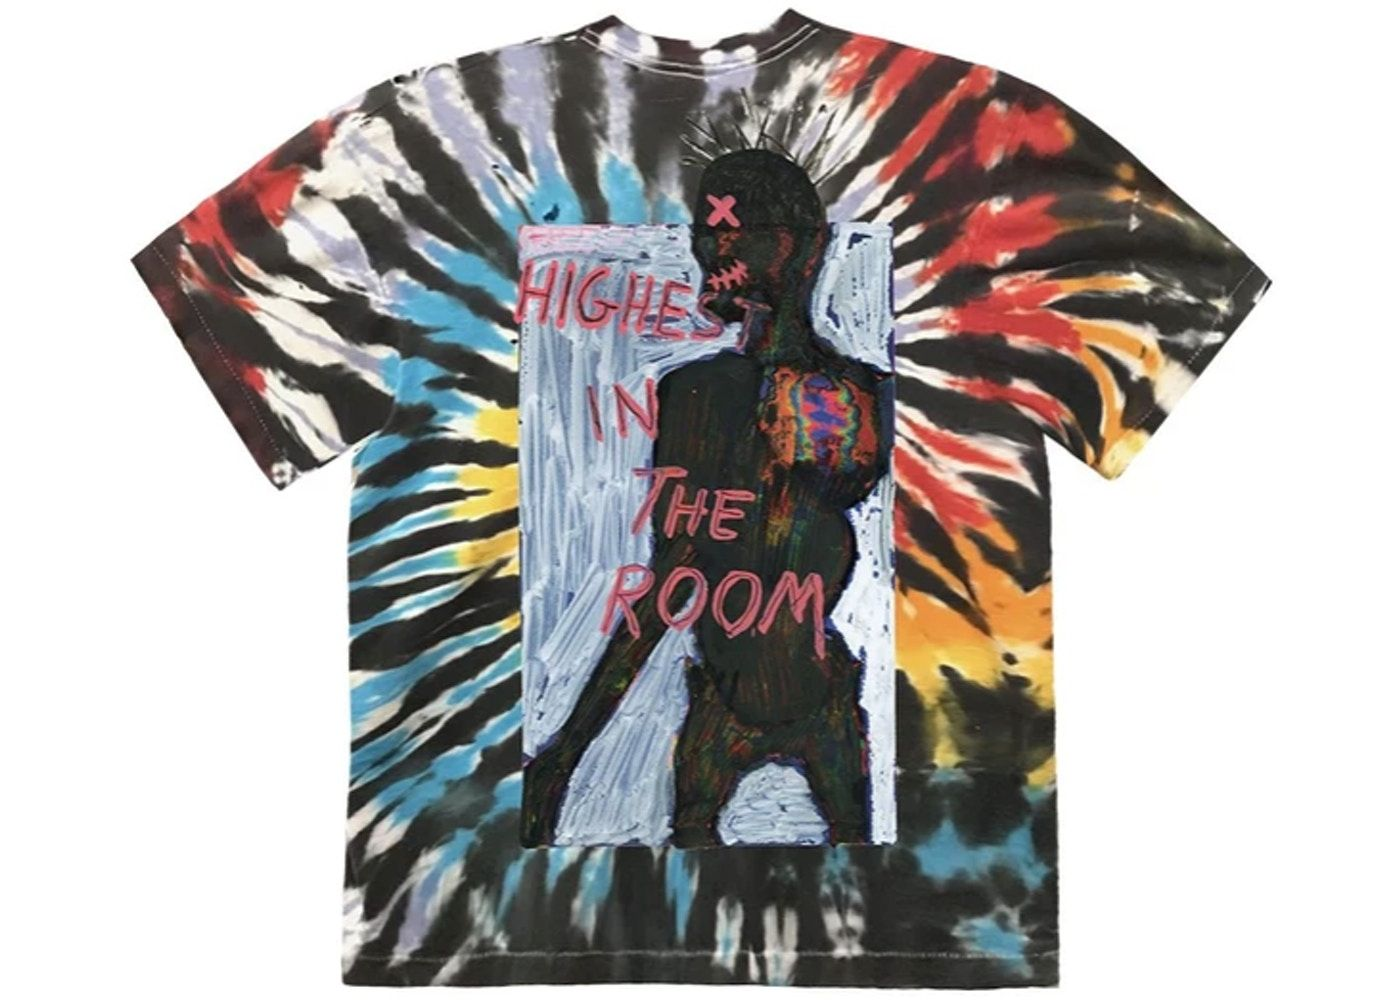 Travis Scott Highest In The Room Tee Tie Dye In 2021 Tie Dye T Shirts Mens Tshirts Dye T Shirt [ 1000 x 1400 Pixel ]